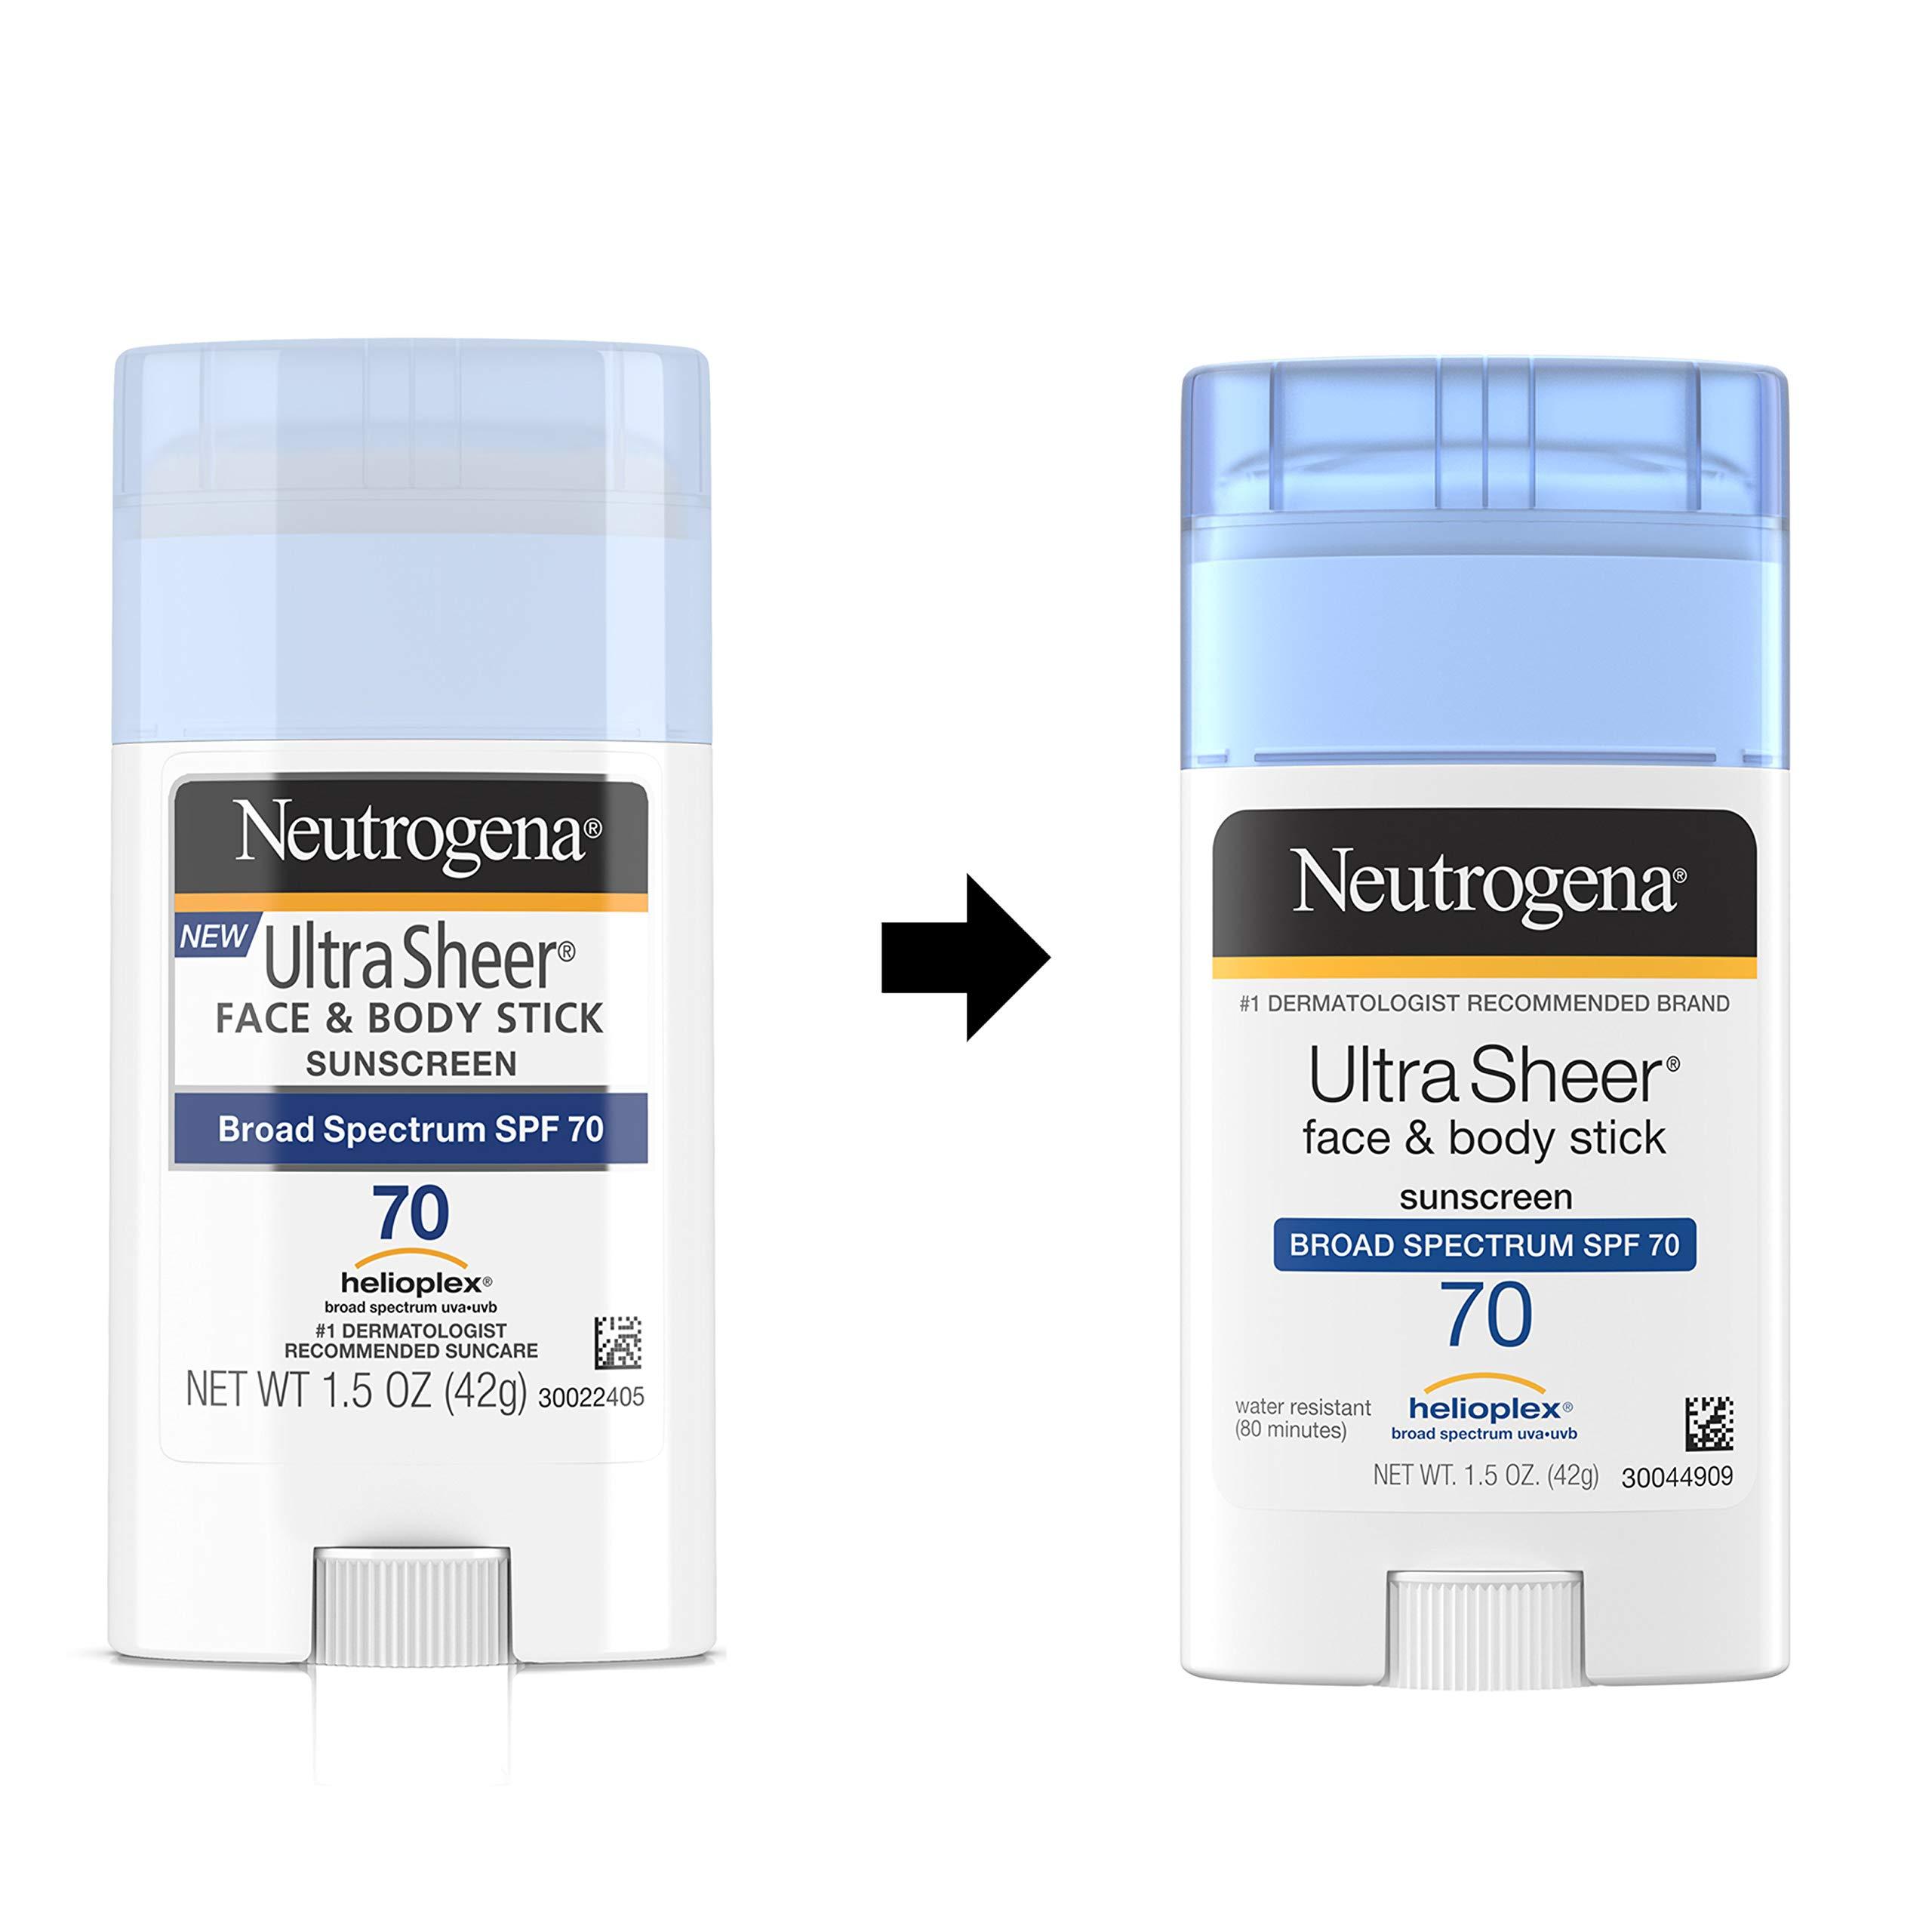 Neutrogena Ultra Sheer Non-Greasy Sunscreen Stick - 2 for $9 at Amazon